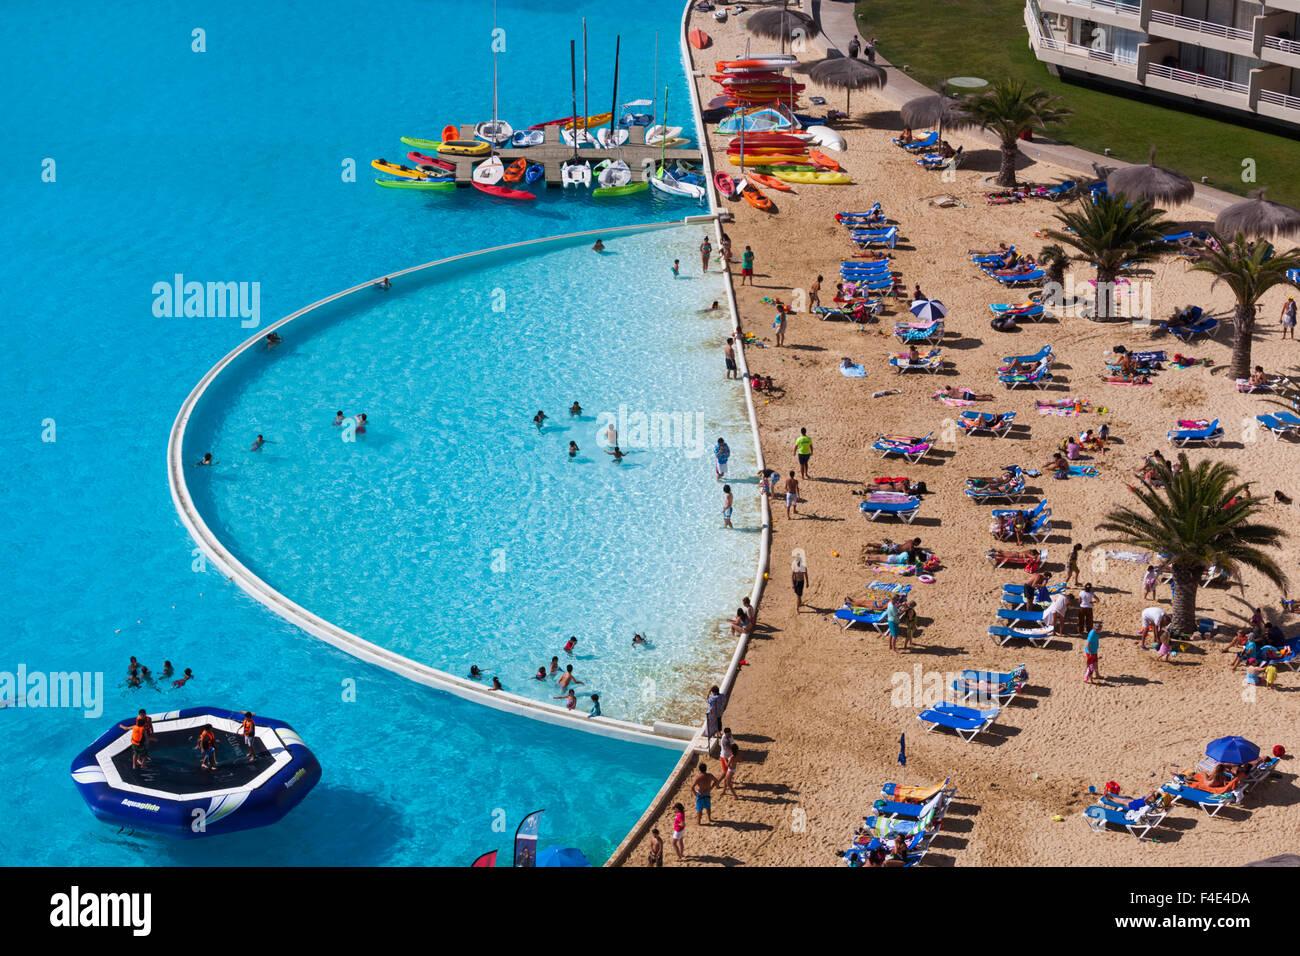 San alfonso del mar chile stock photos san alfonso del - San alfonso del mar resort swimming pool ...